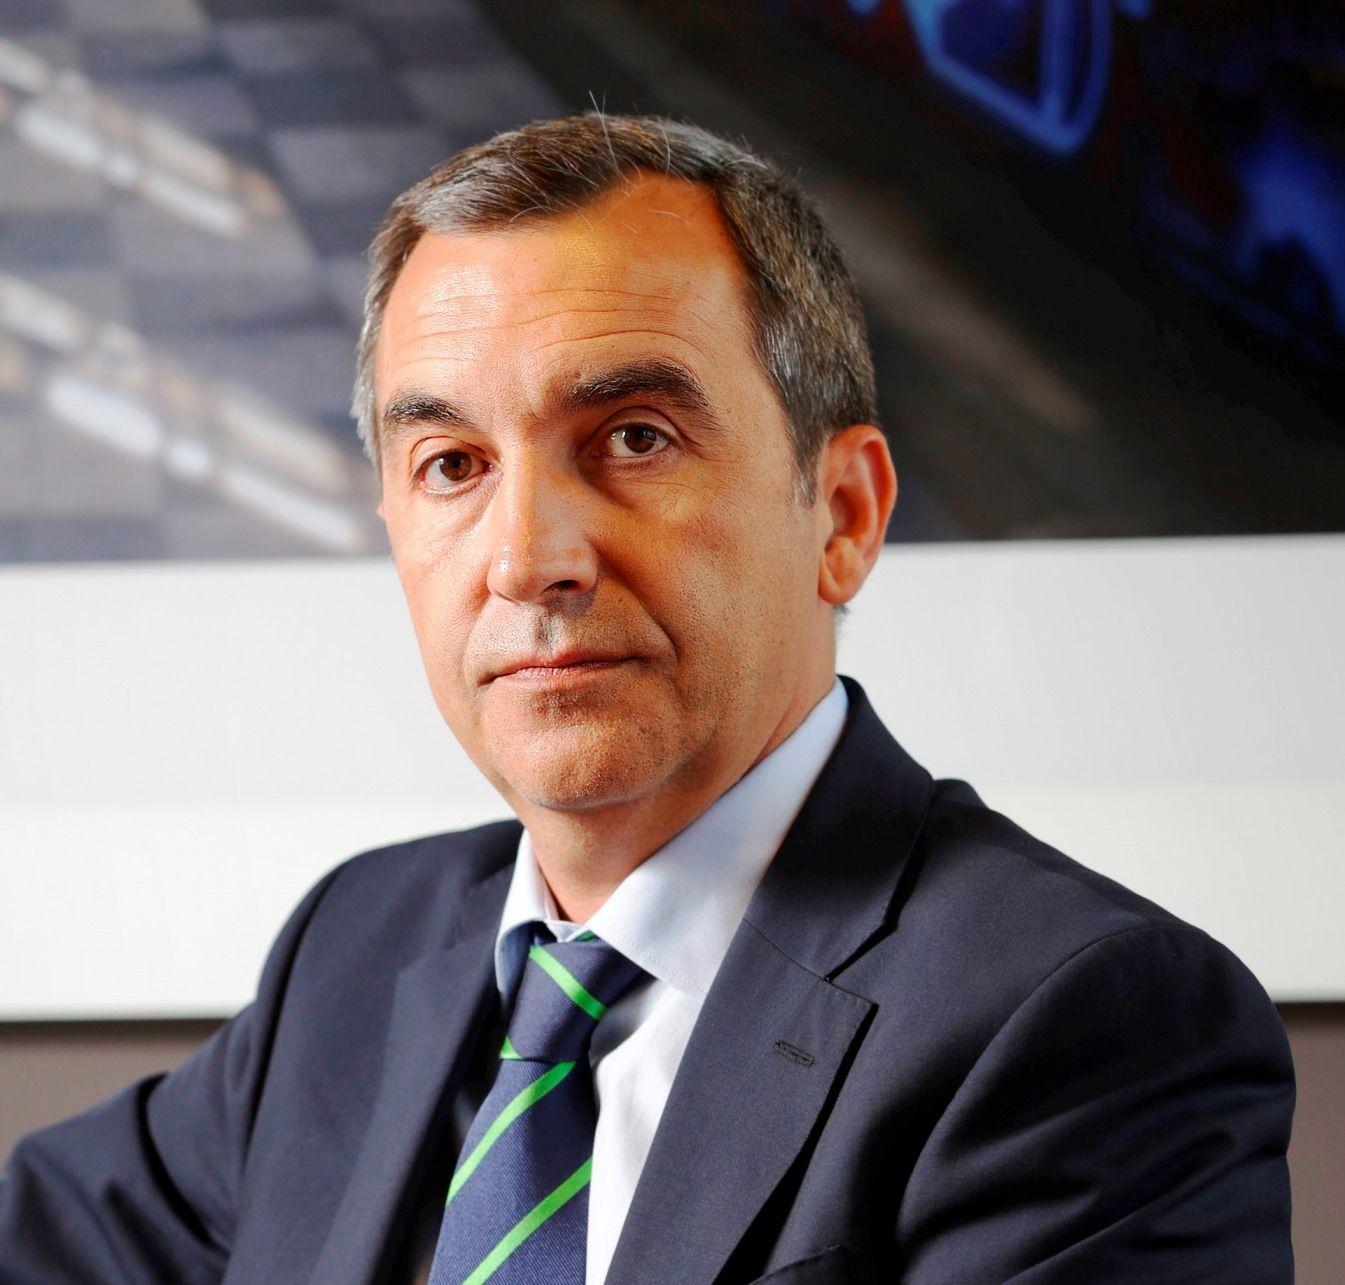 Albert Sagués